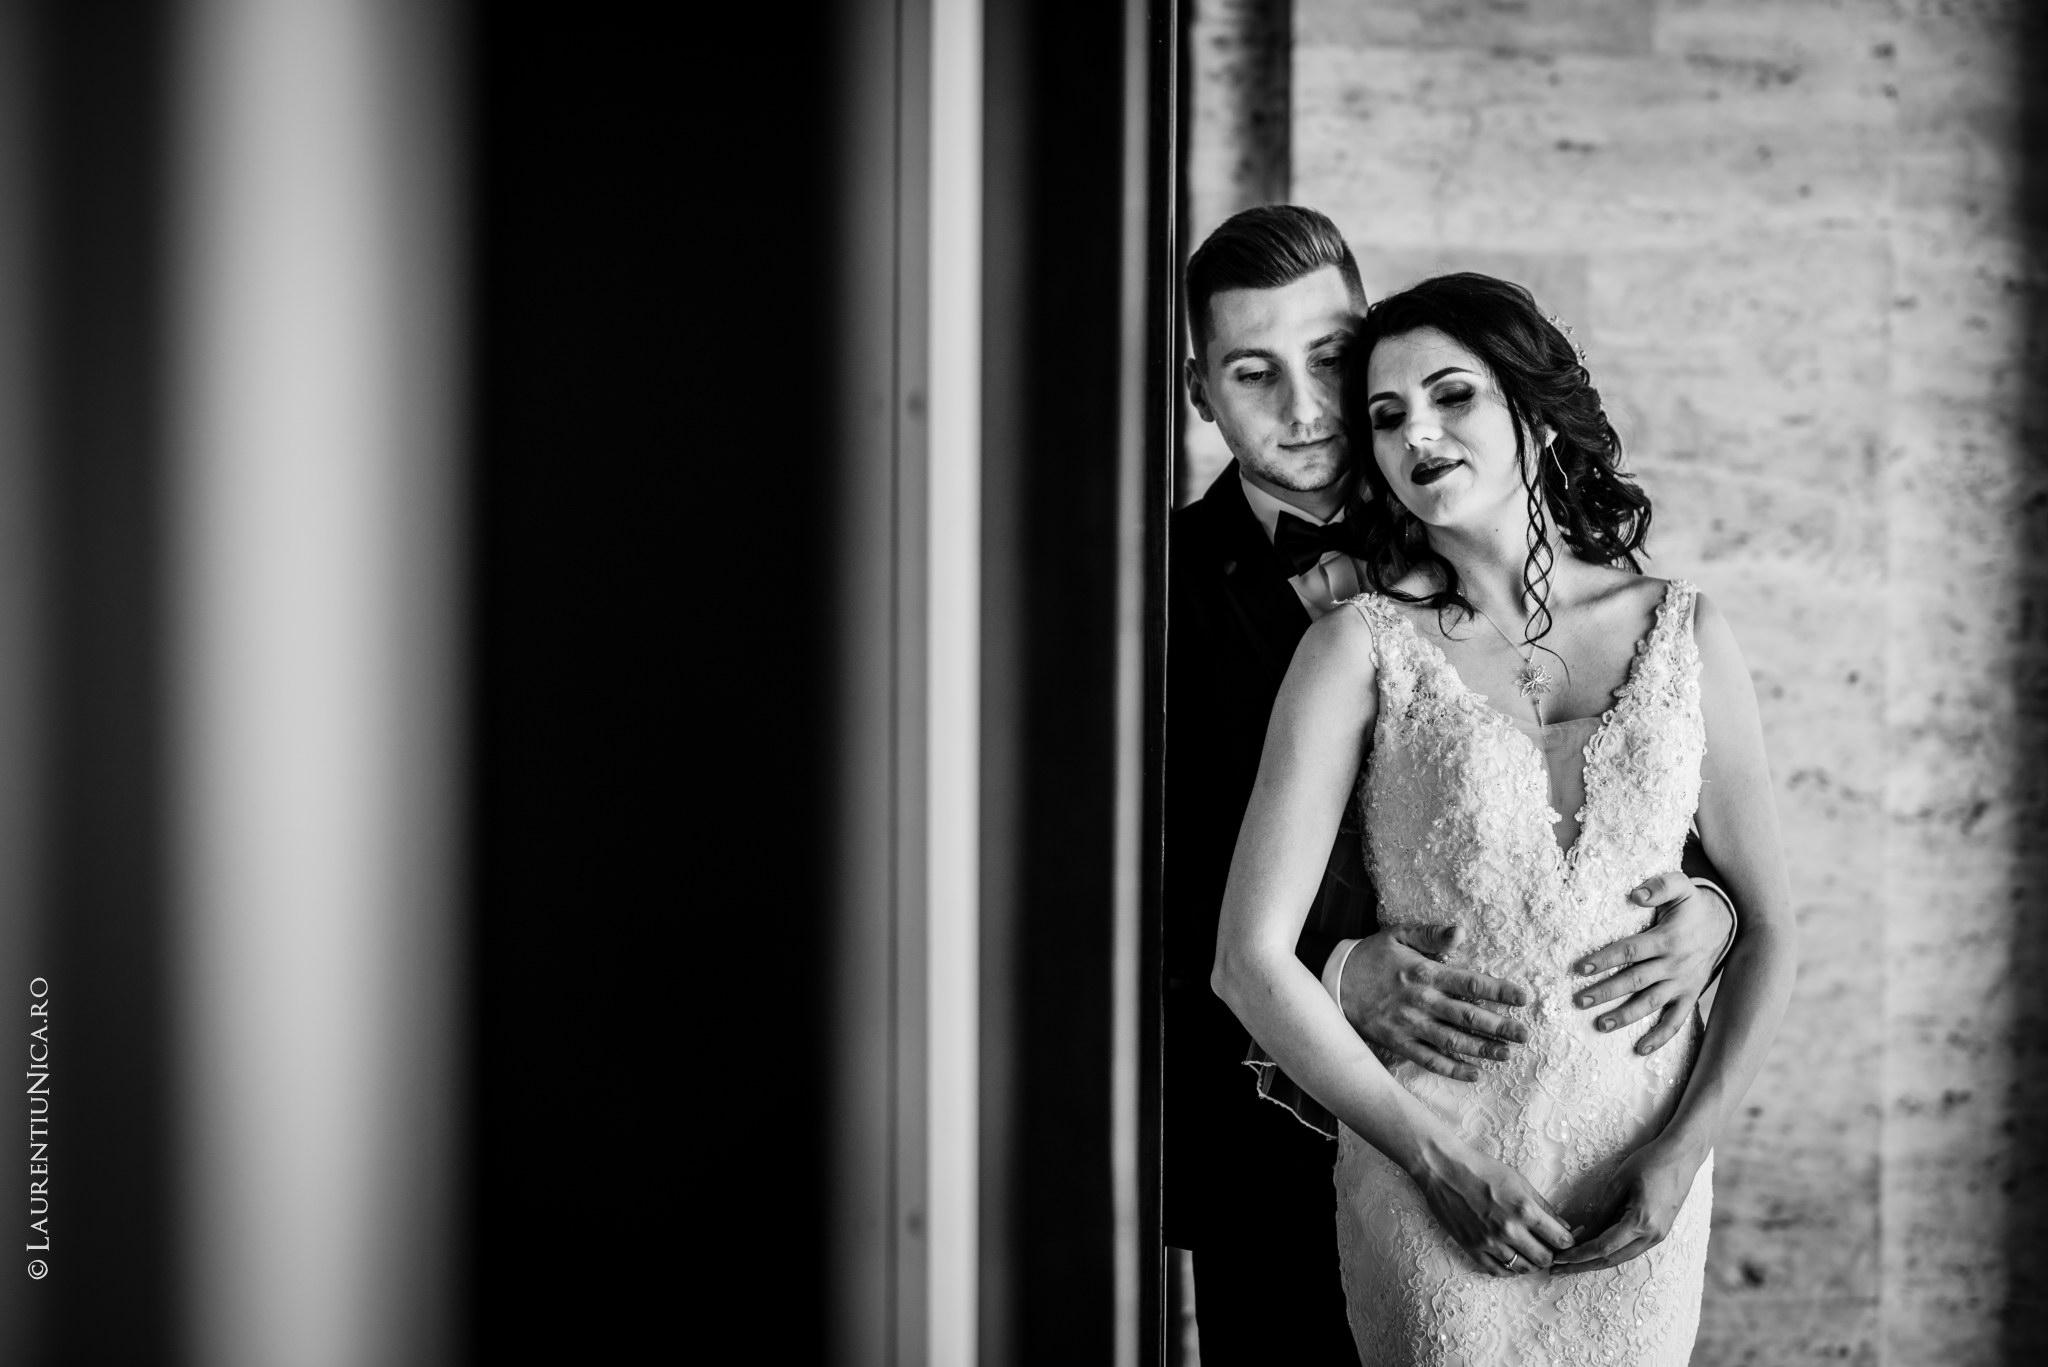 fotografii nunta craiova bia alex fotograf nunta laurentiu nica 33 - Bia & Alex | Fotografii nunta | Craiova